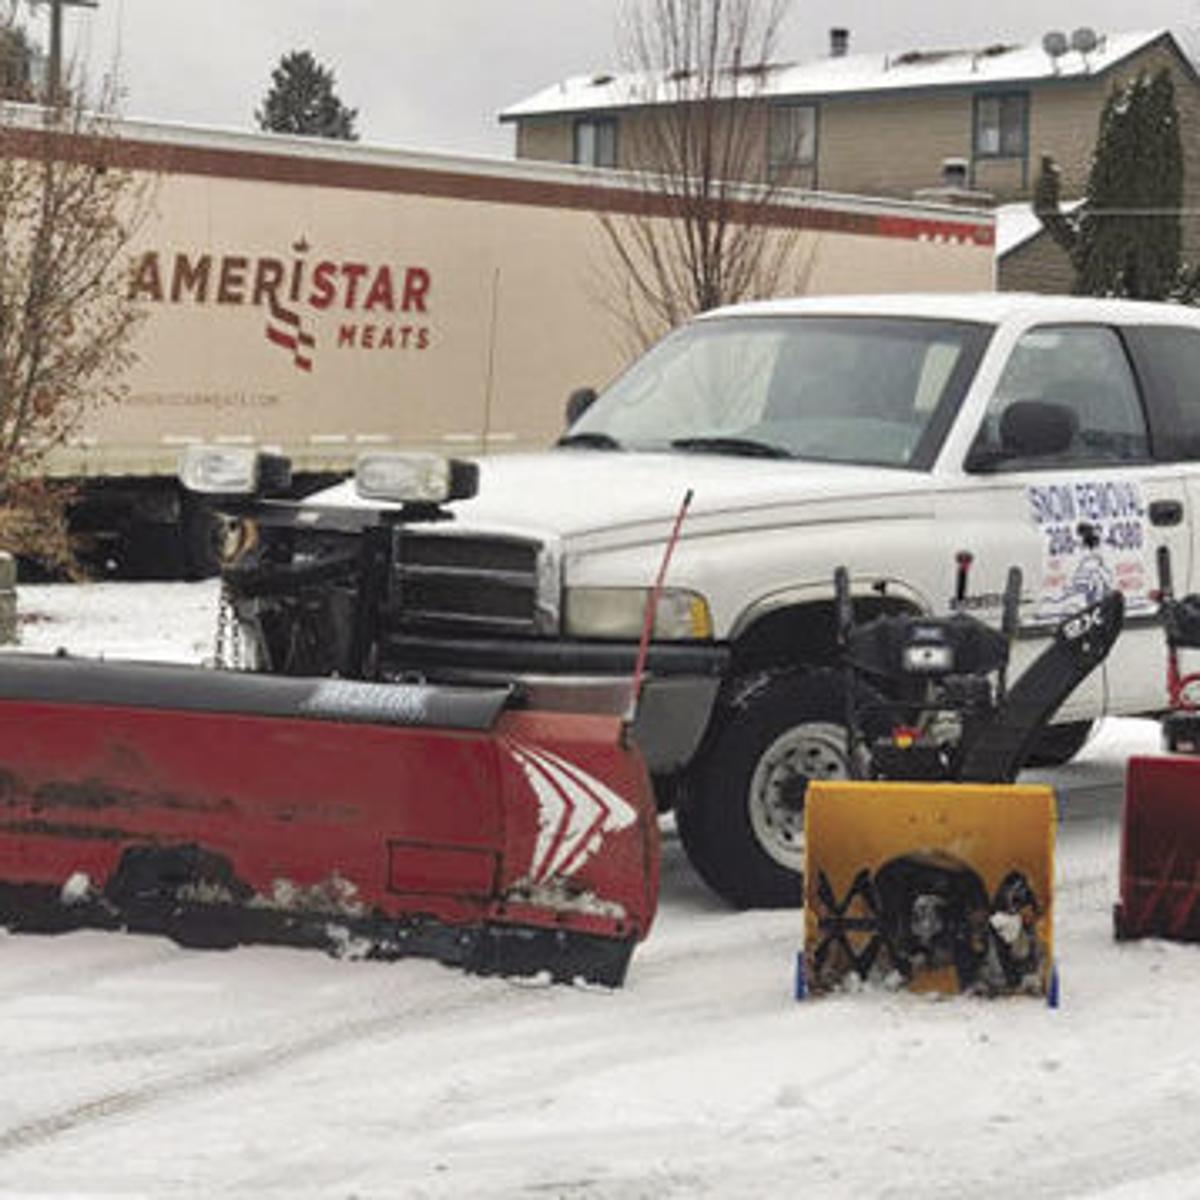 Idaho Teen I Made 35k In 4 Days Plowing Seattle S Snow Local Idahostatejournal Com By idaho falls news on july 18, 2016 / 0 comments. idaho teen i made 35k in 4 days